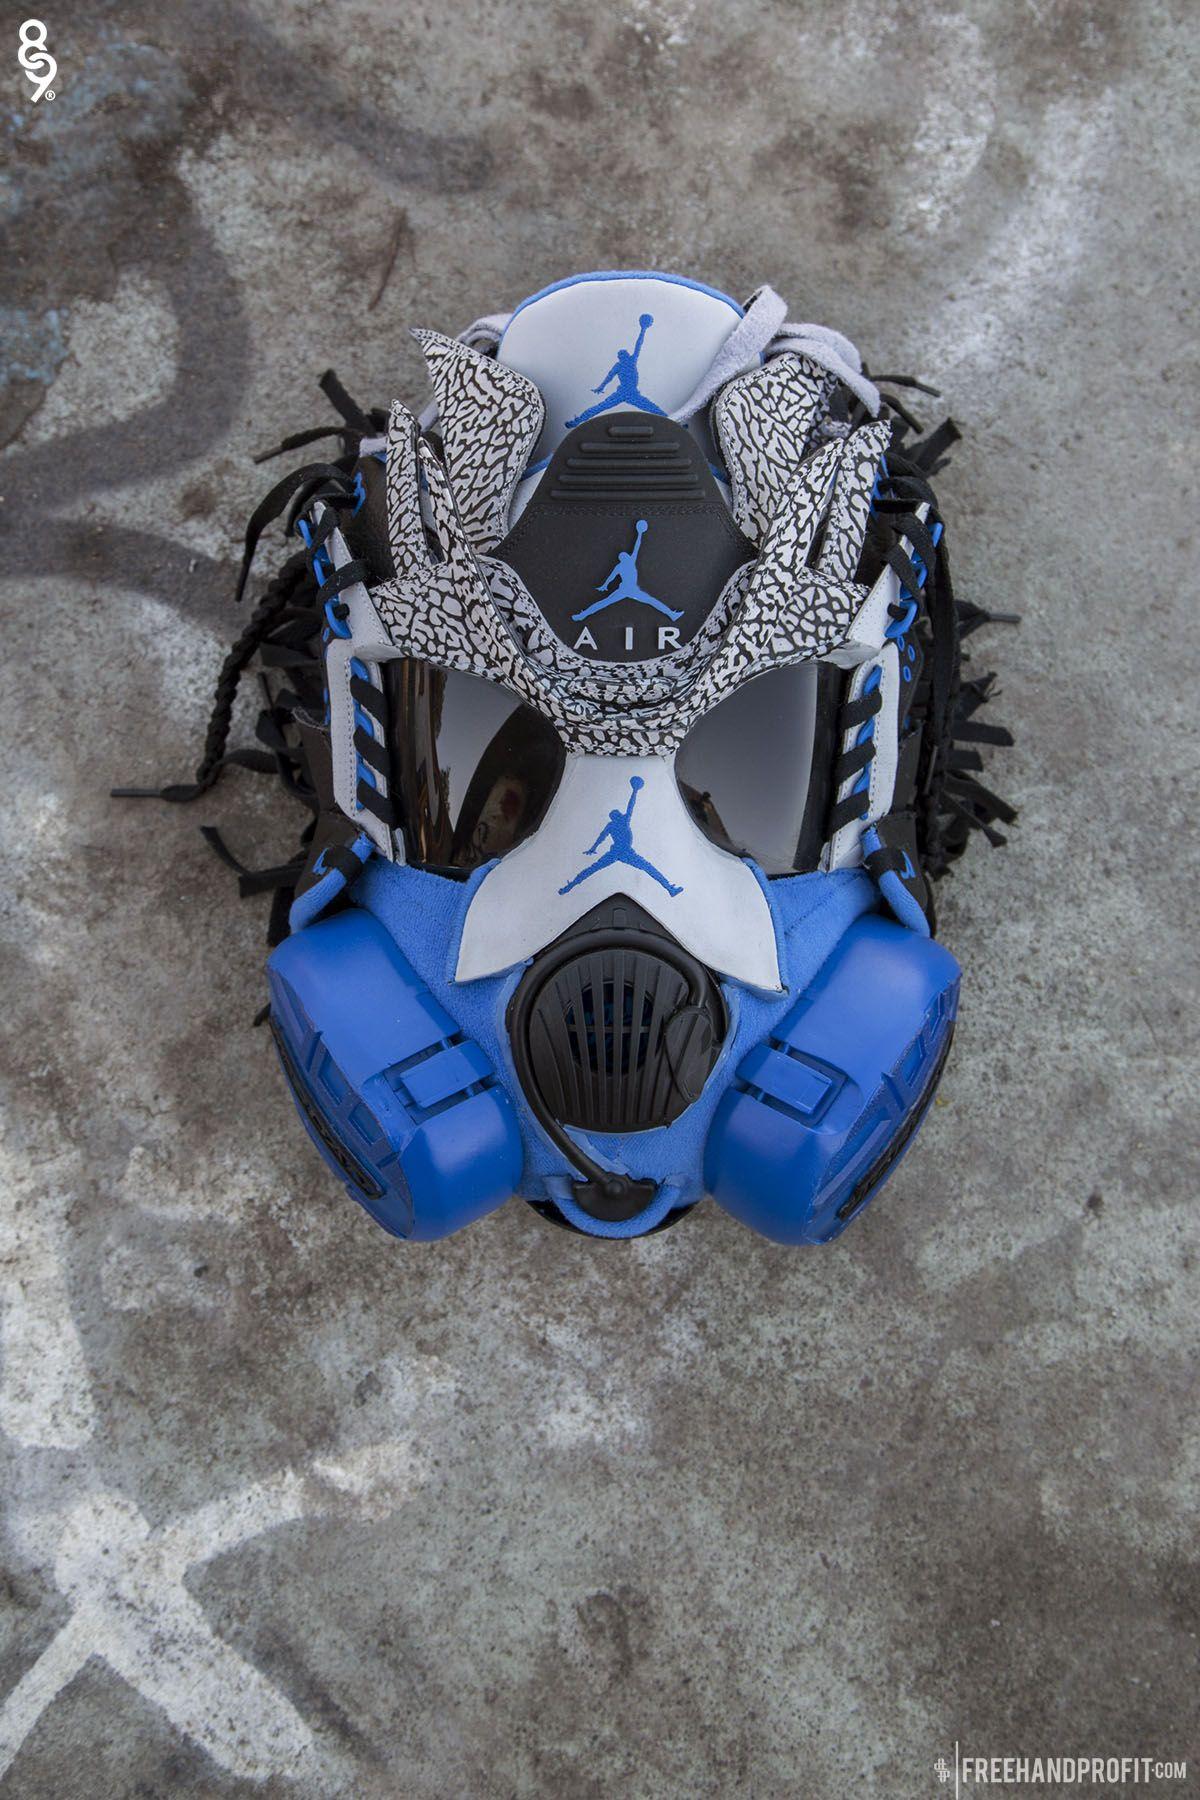 jordan sport blue 3 mask by freehand profit (2) Gas mask